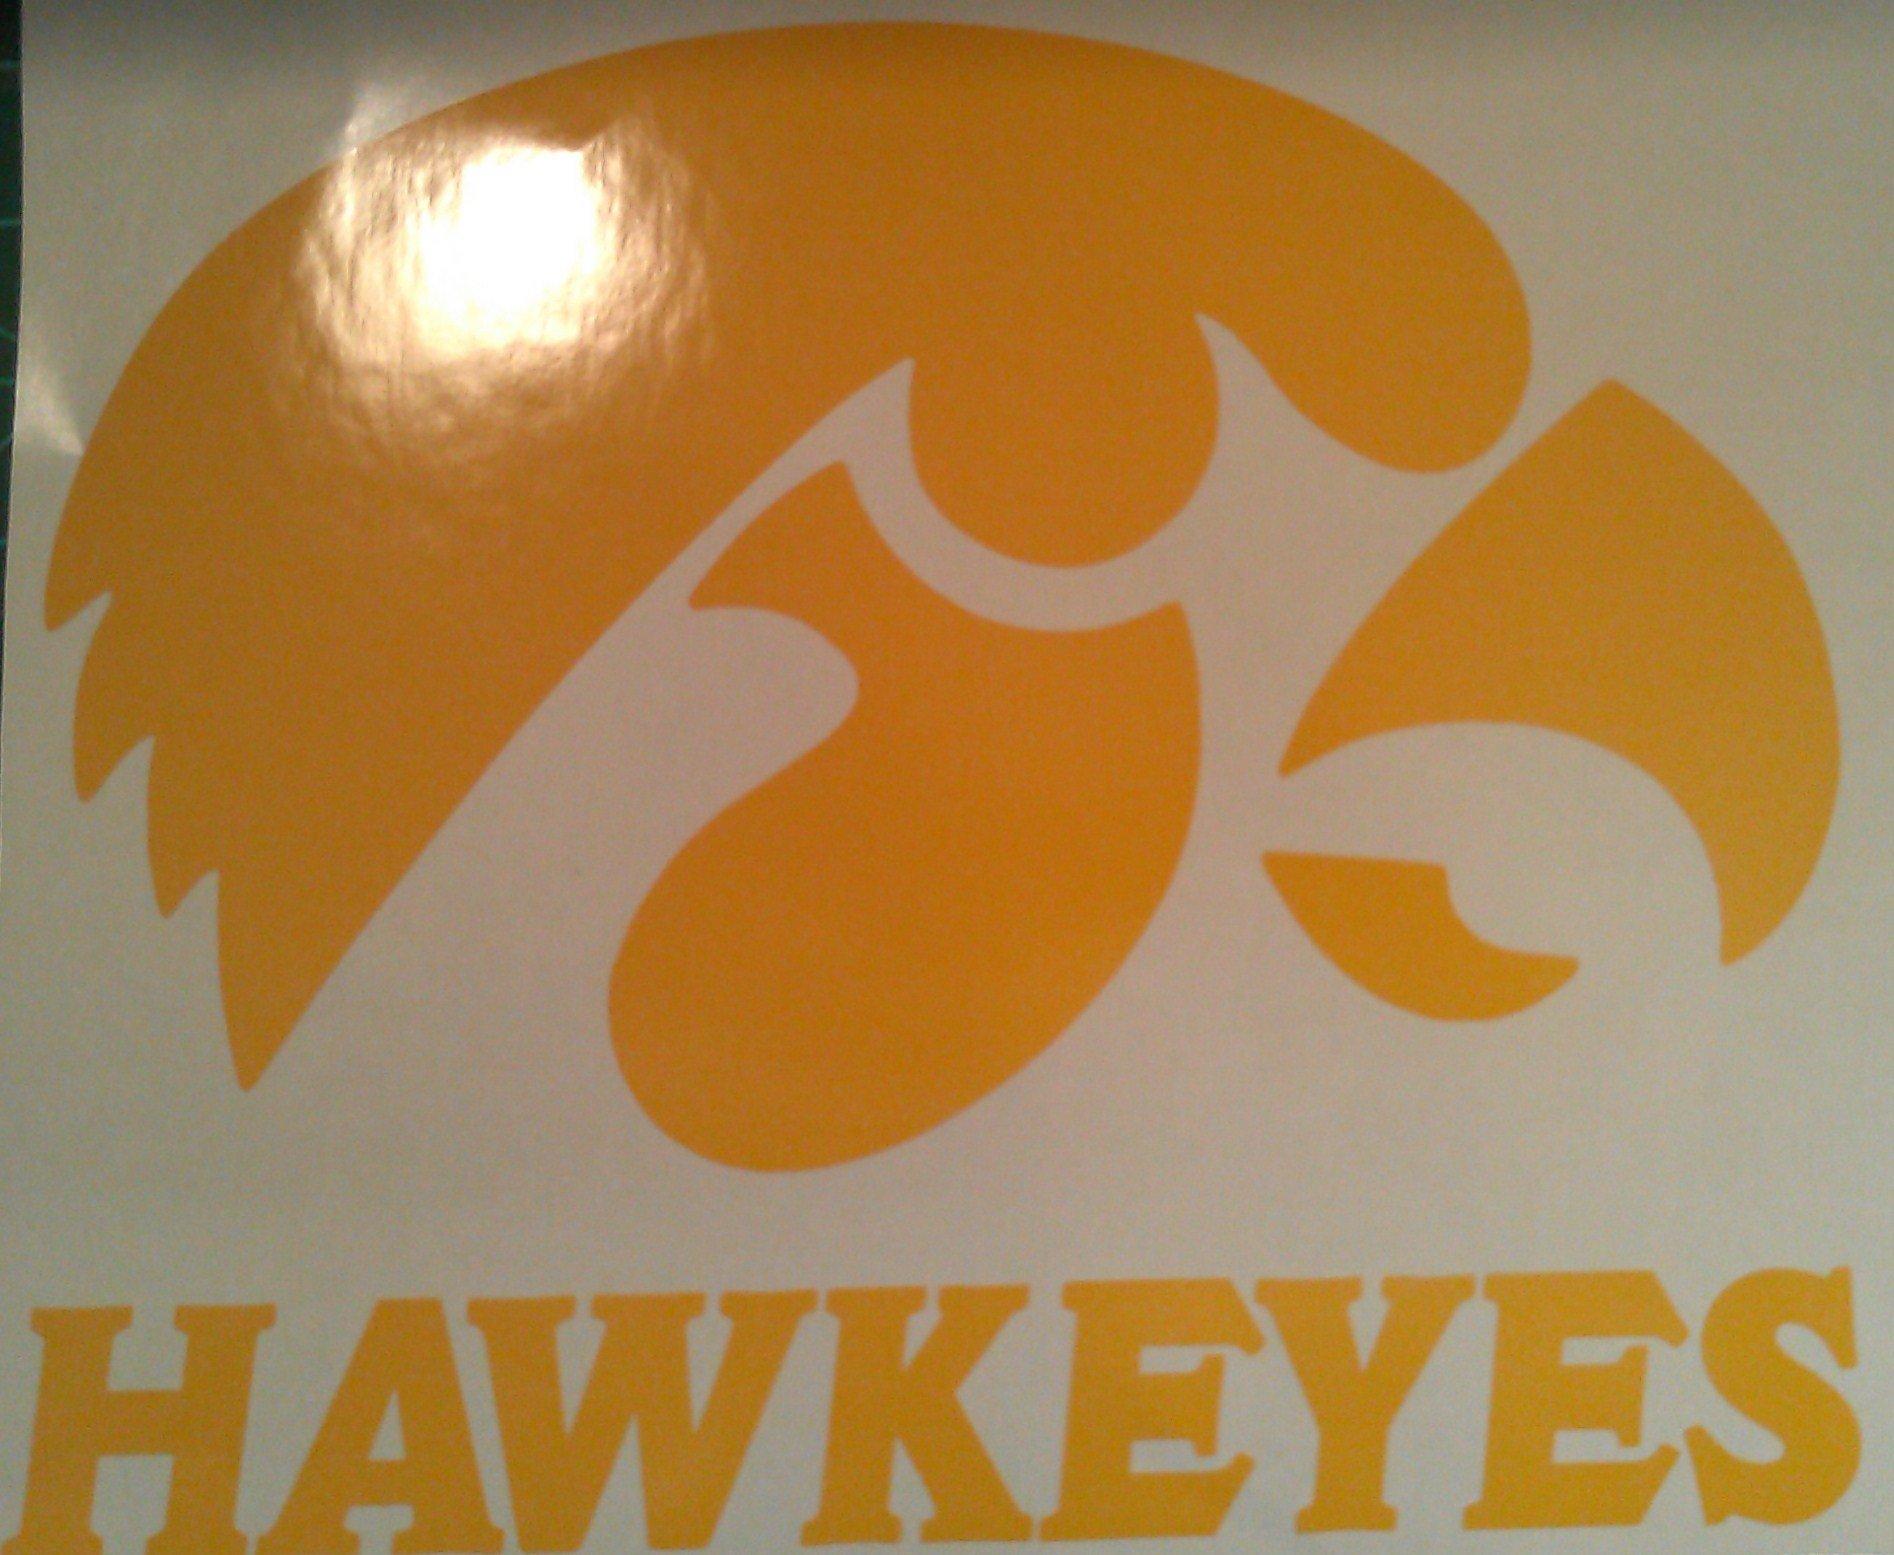 Iowa State Hawkeyes Cornhole Decals - 2 Cornhole Decals